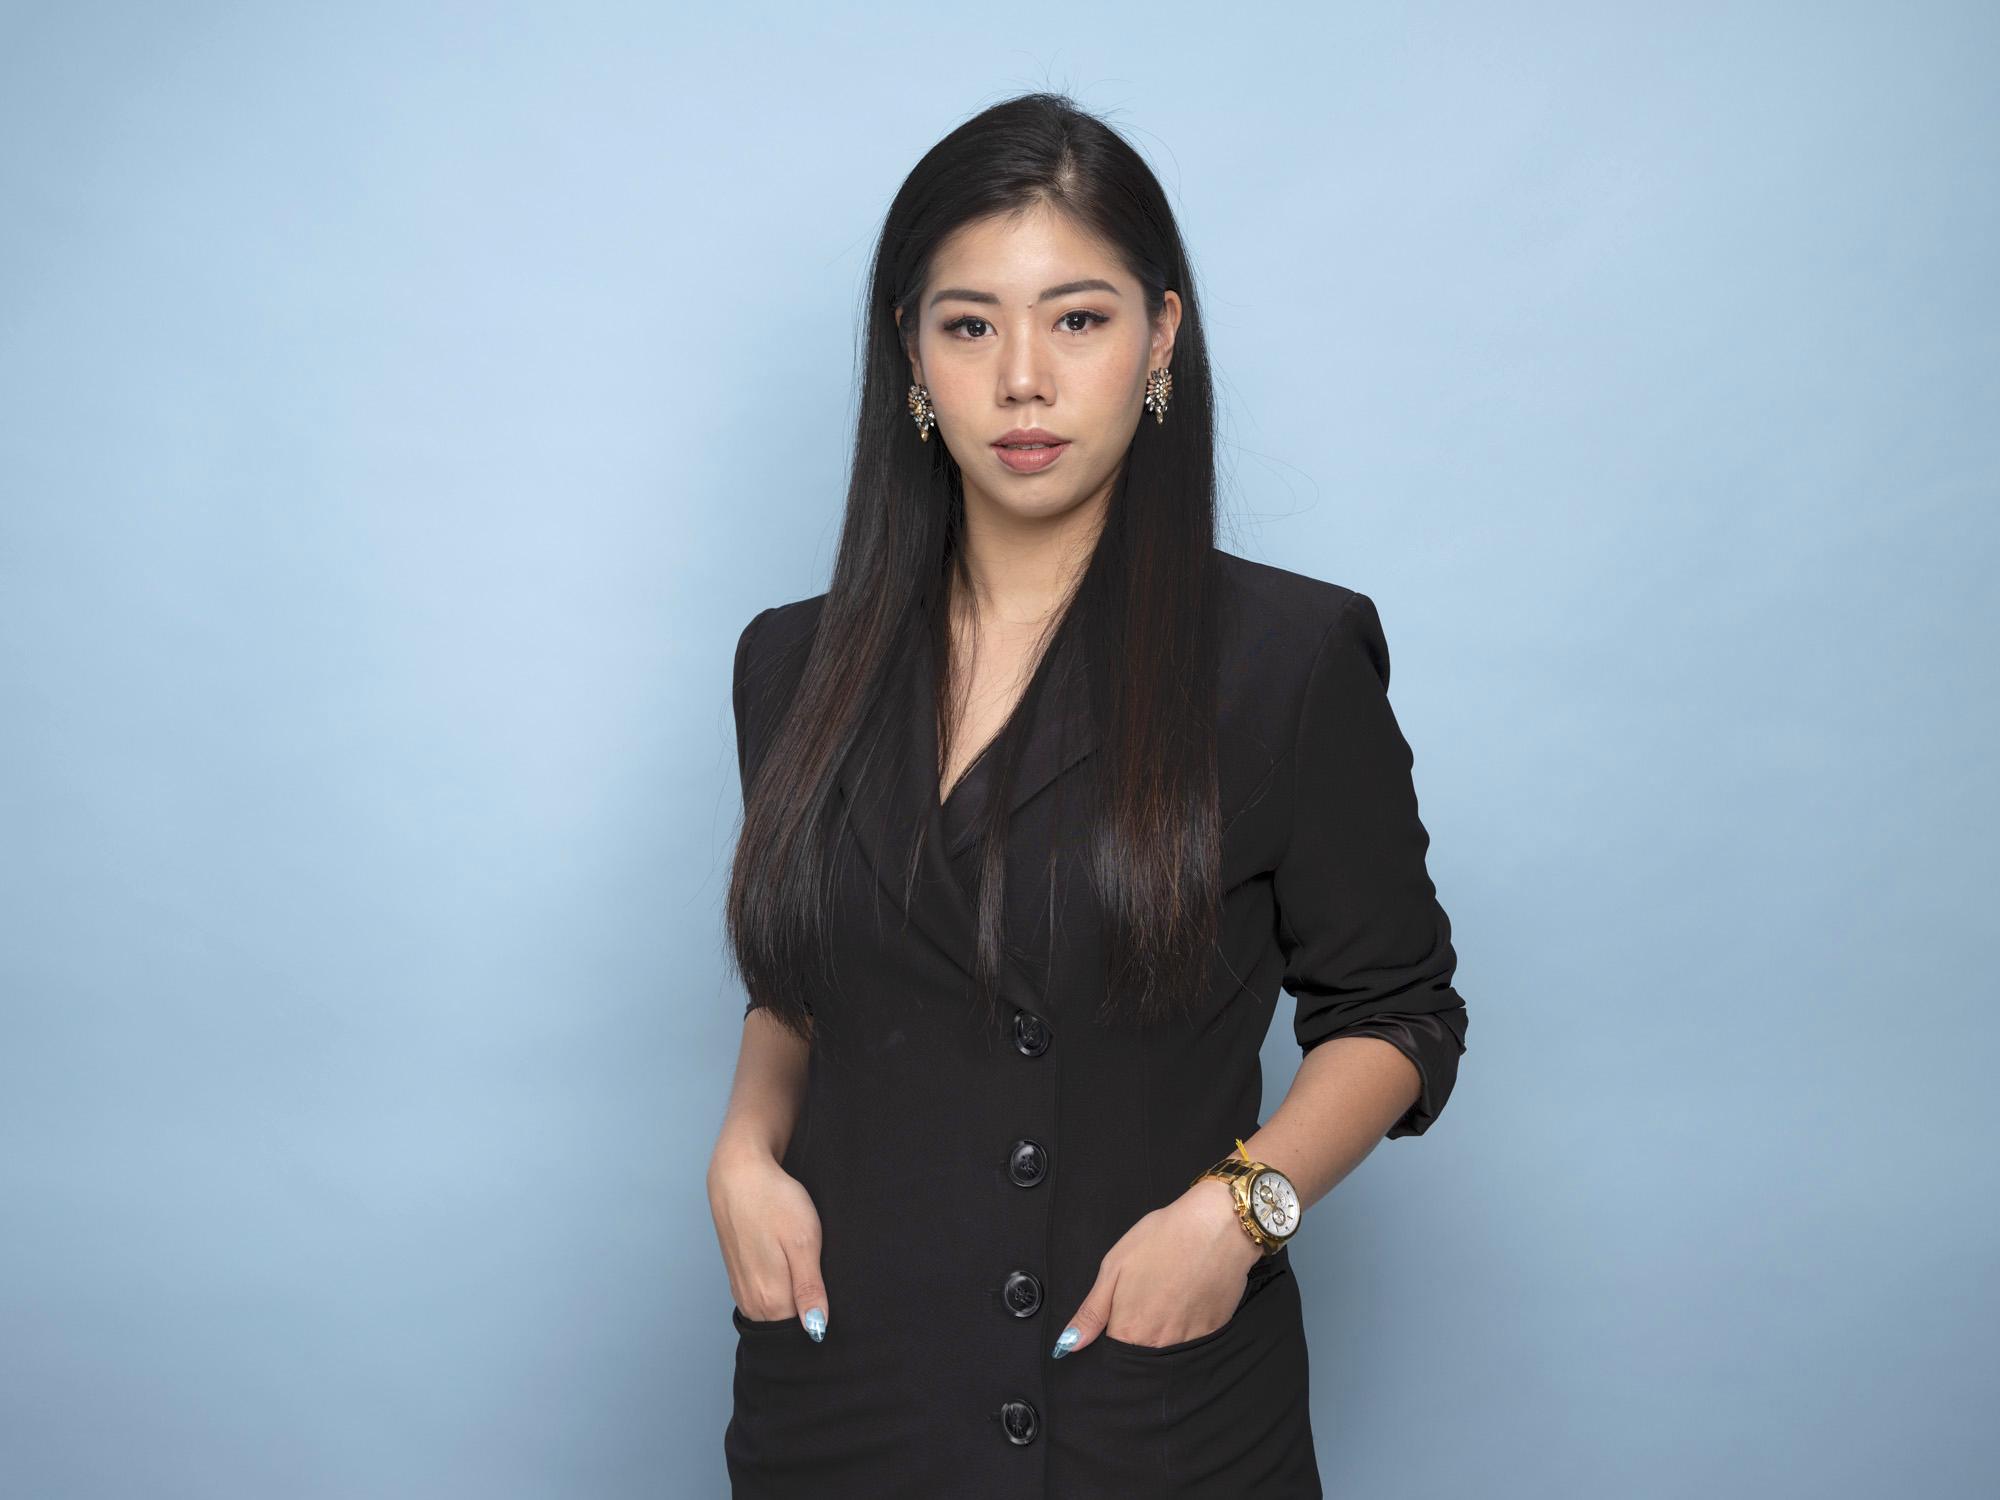 Corporate headshot portrait linkedin photography studio singapore services asia photographer coco pr agency